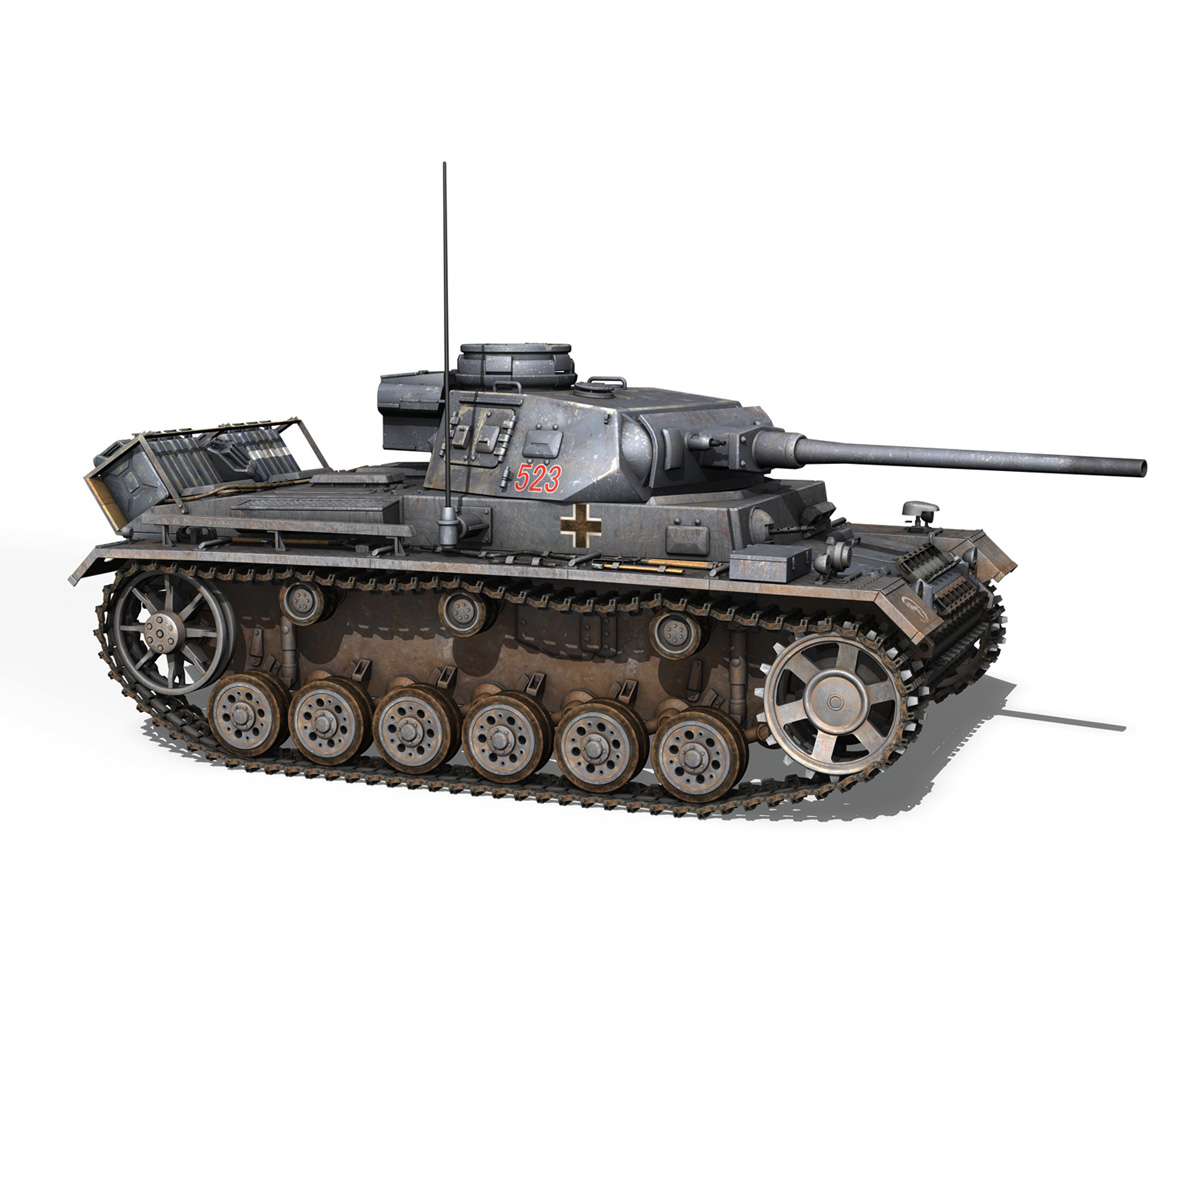 pzkpfw iii – panzer 3 – ausf.j – 523 3d model 3ds fbx c4d lwo obj 189080